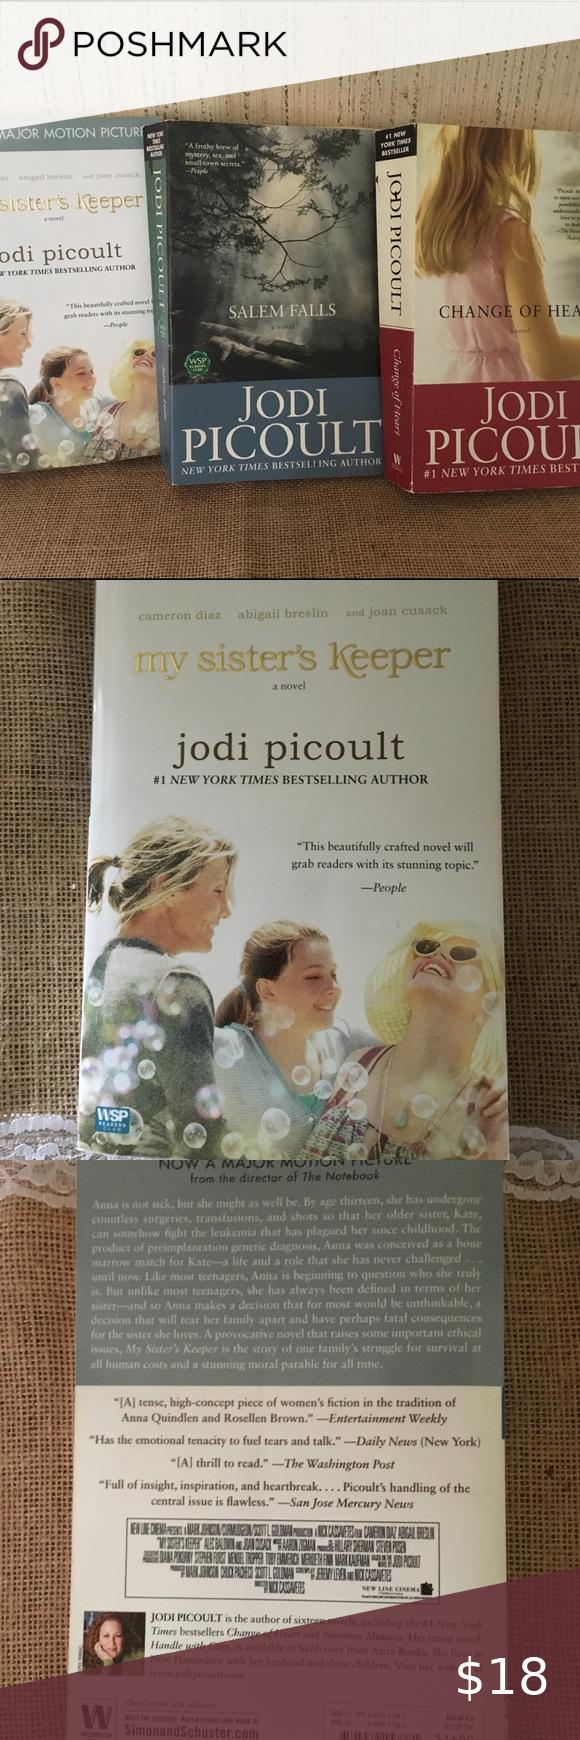 Jodi Picoult Novels Set Of 3 Books Novels Book Cover Page Books